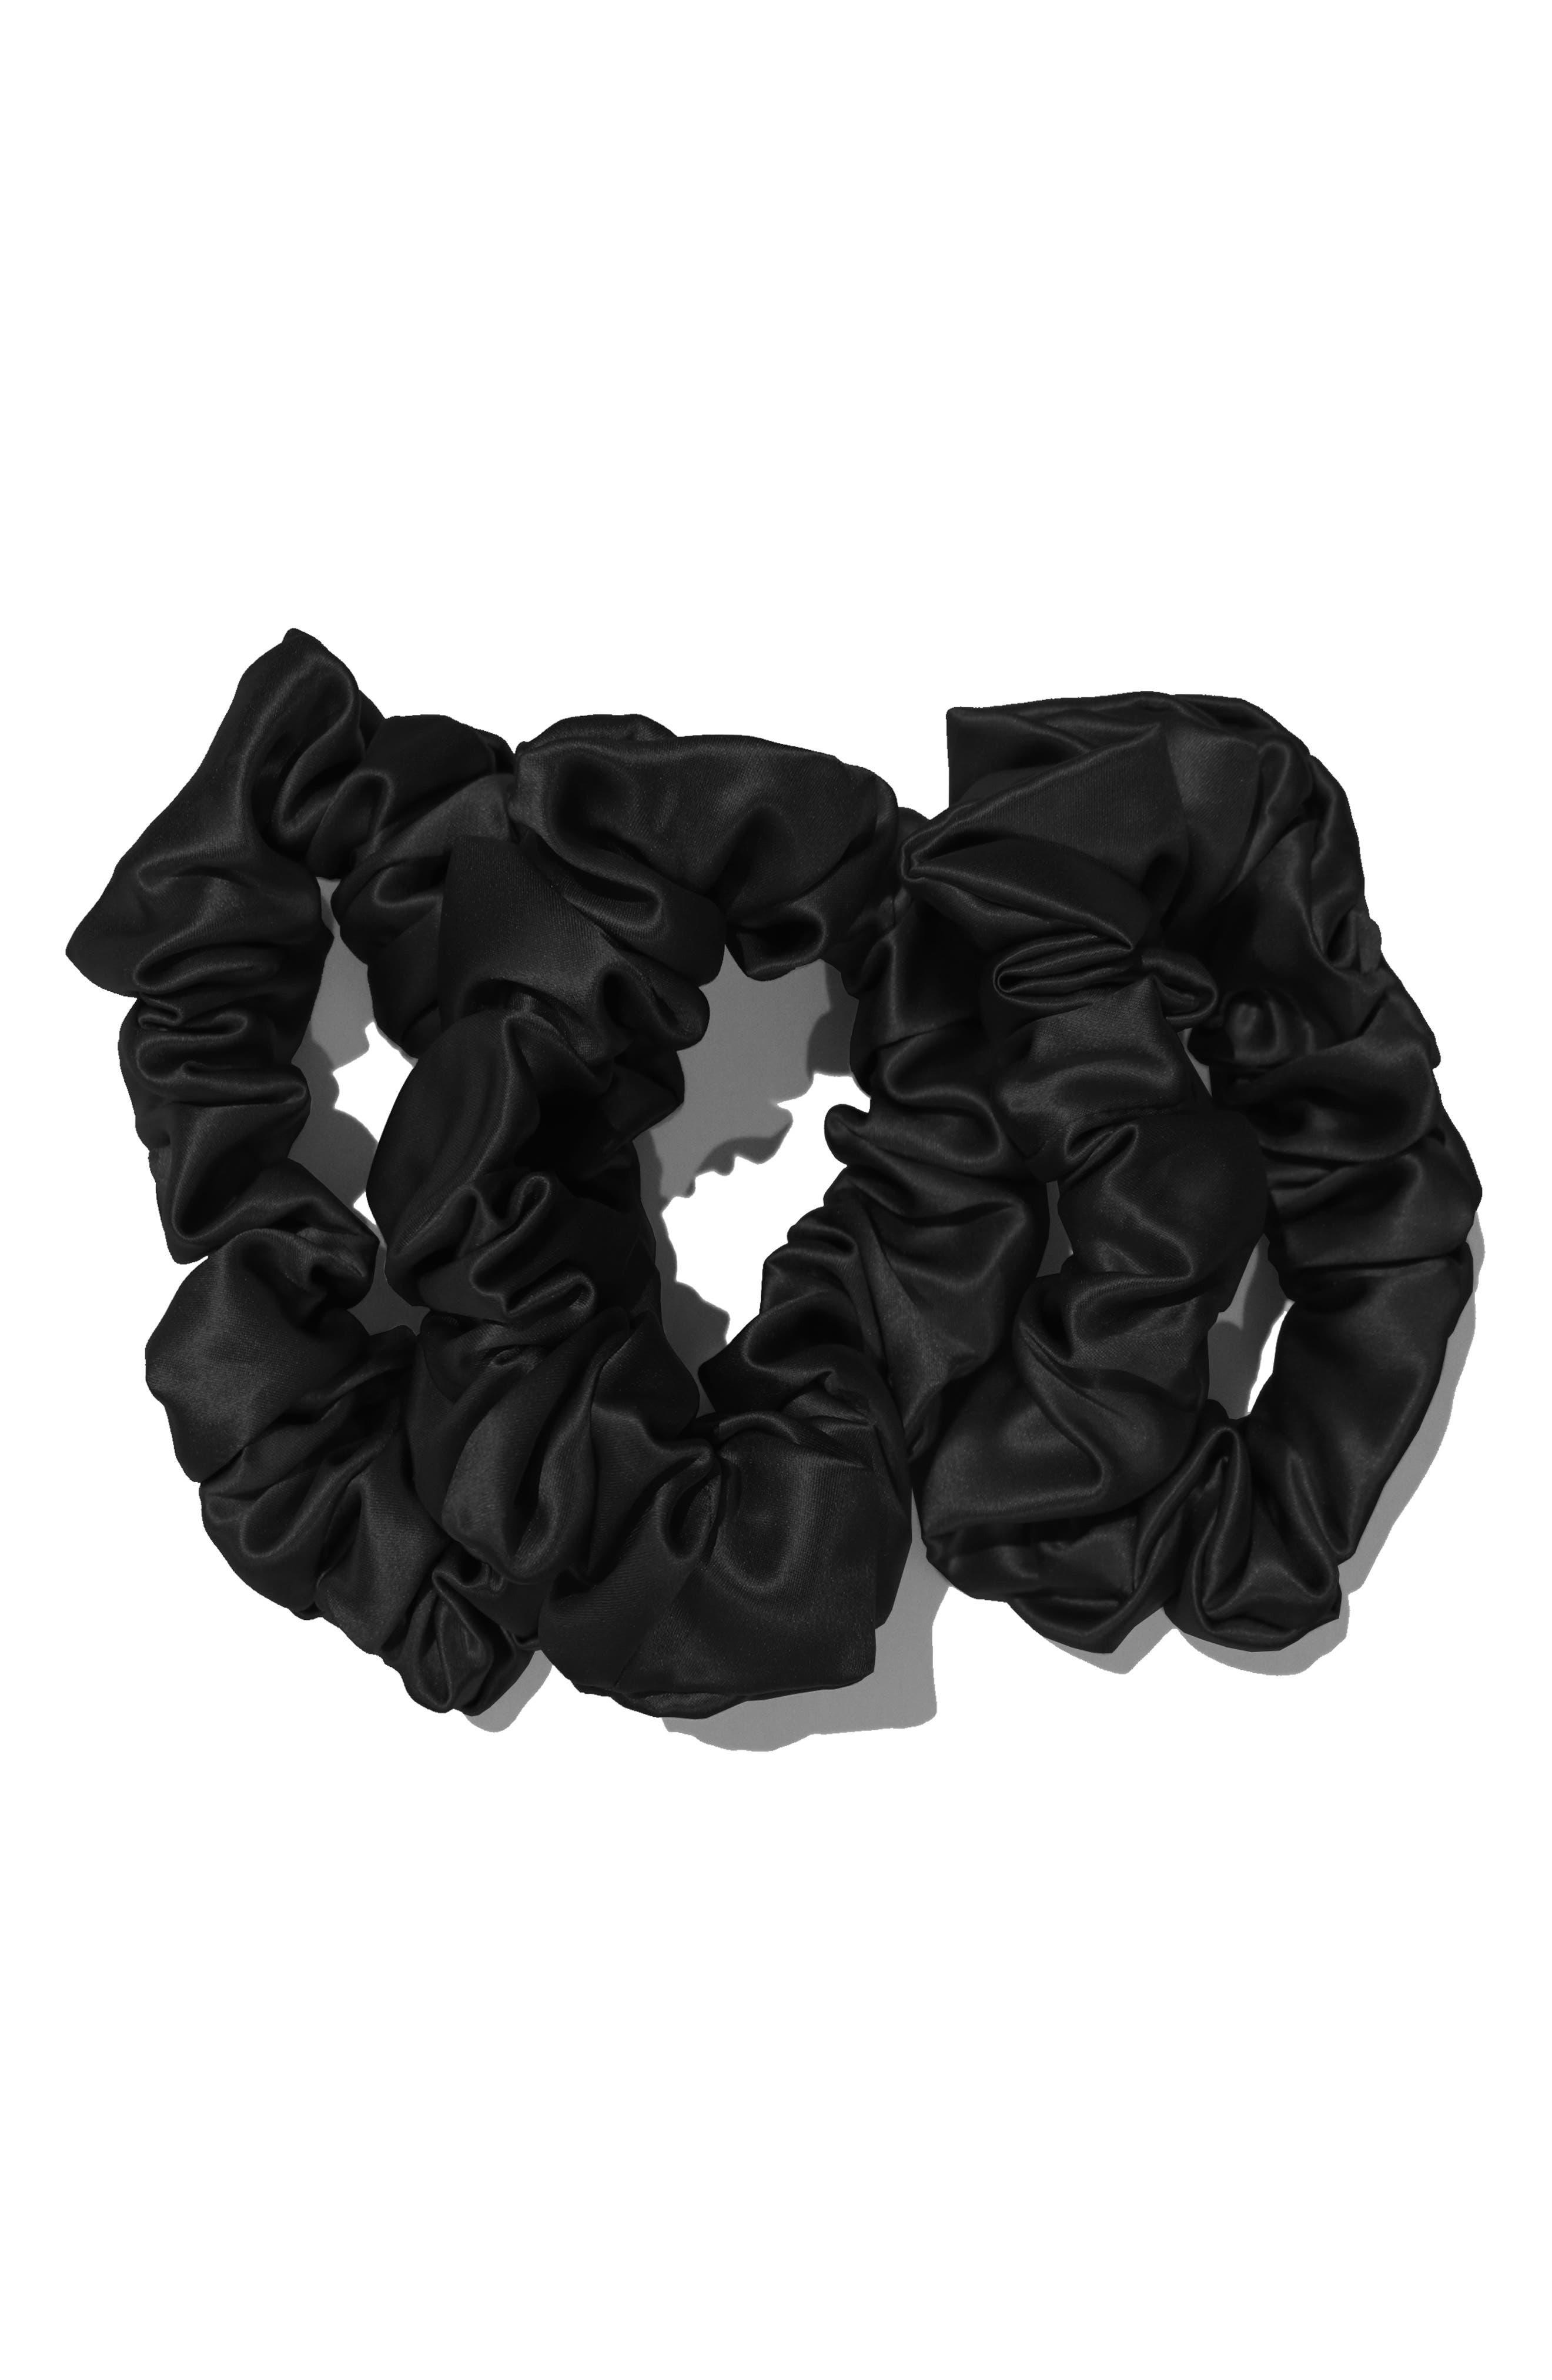 slip<sup>™</sup> for beauty sleep 3-Pack Slipsilk<sup>™</sup> Hair Ties,                             Main thumbnail 1, color,                             BLACK